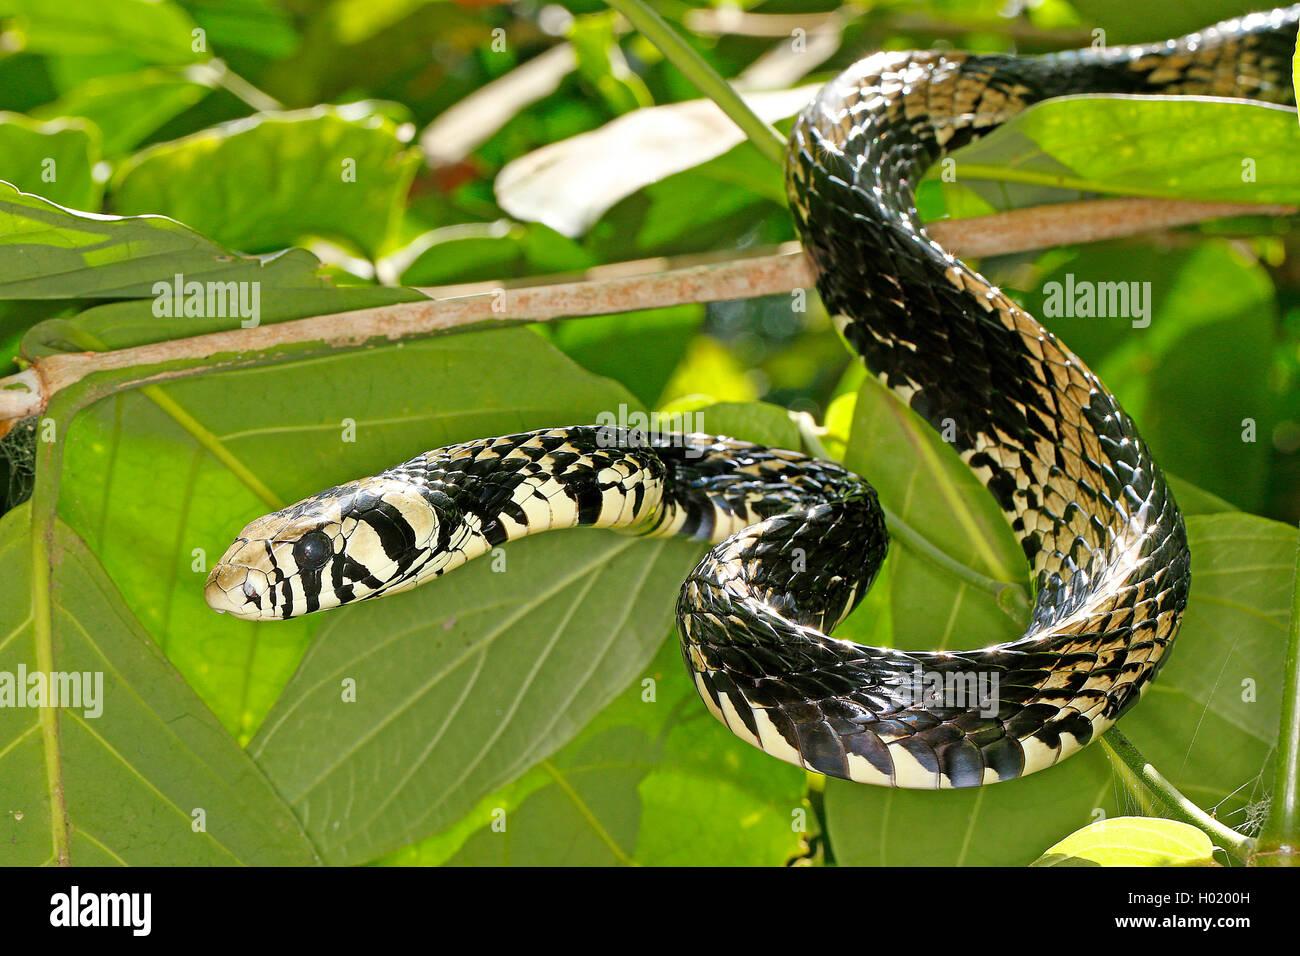 Huehneresser, Huehnerfresser (Spilotes pullatus), Portraet, Costa Rica | Tropical chicken snake, Tiger Ratsnake - Stock Image